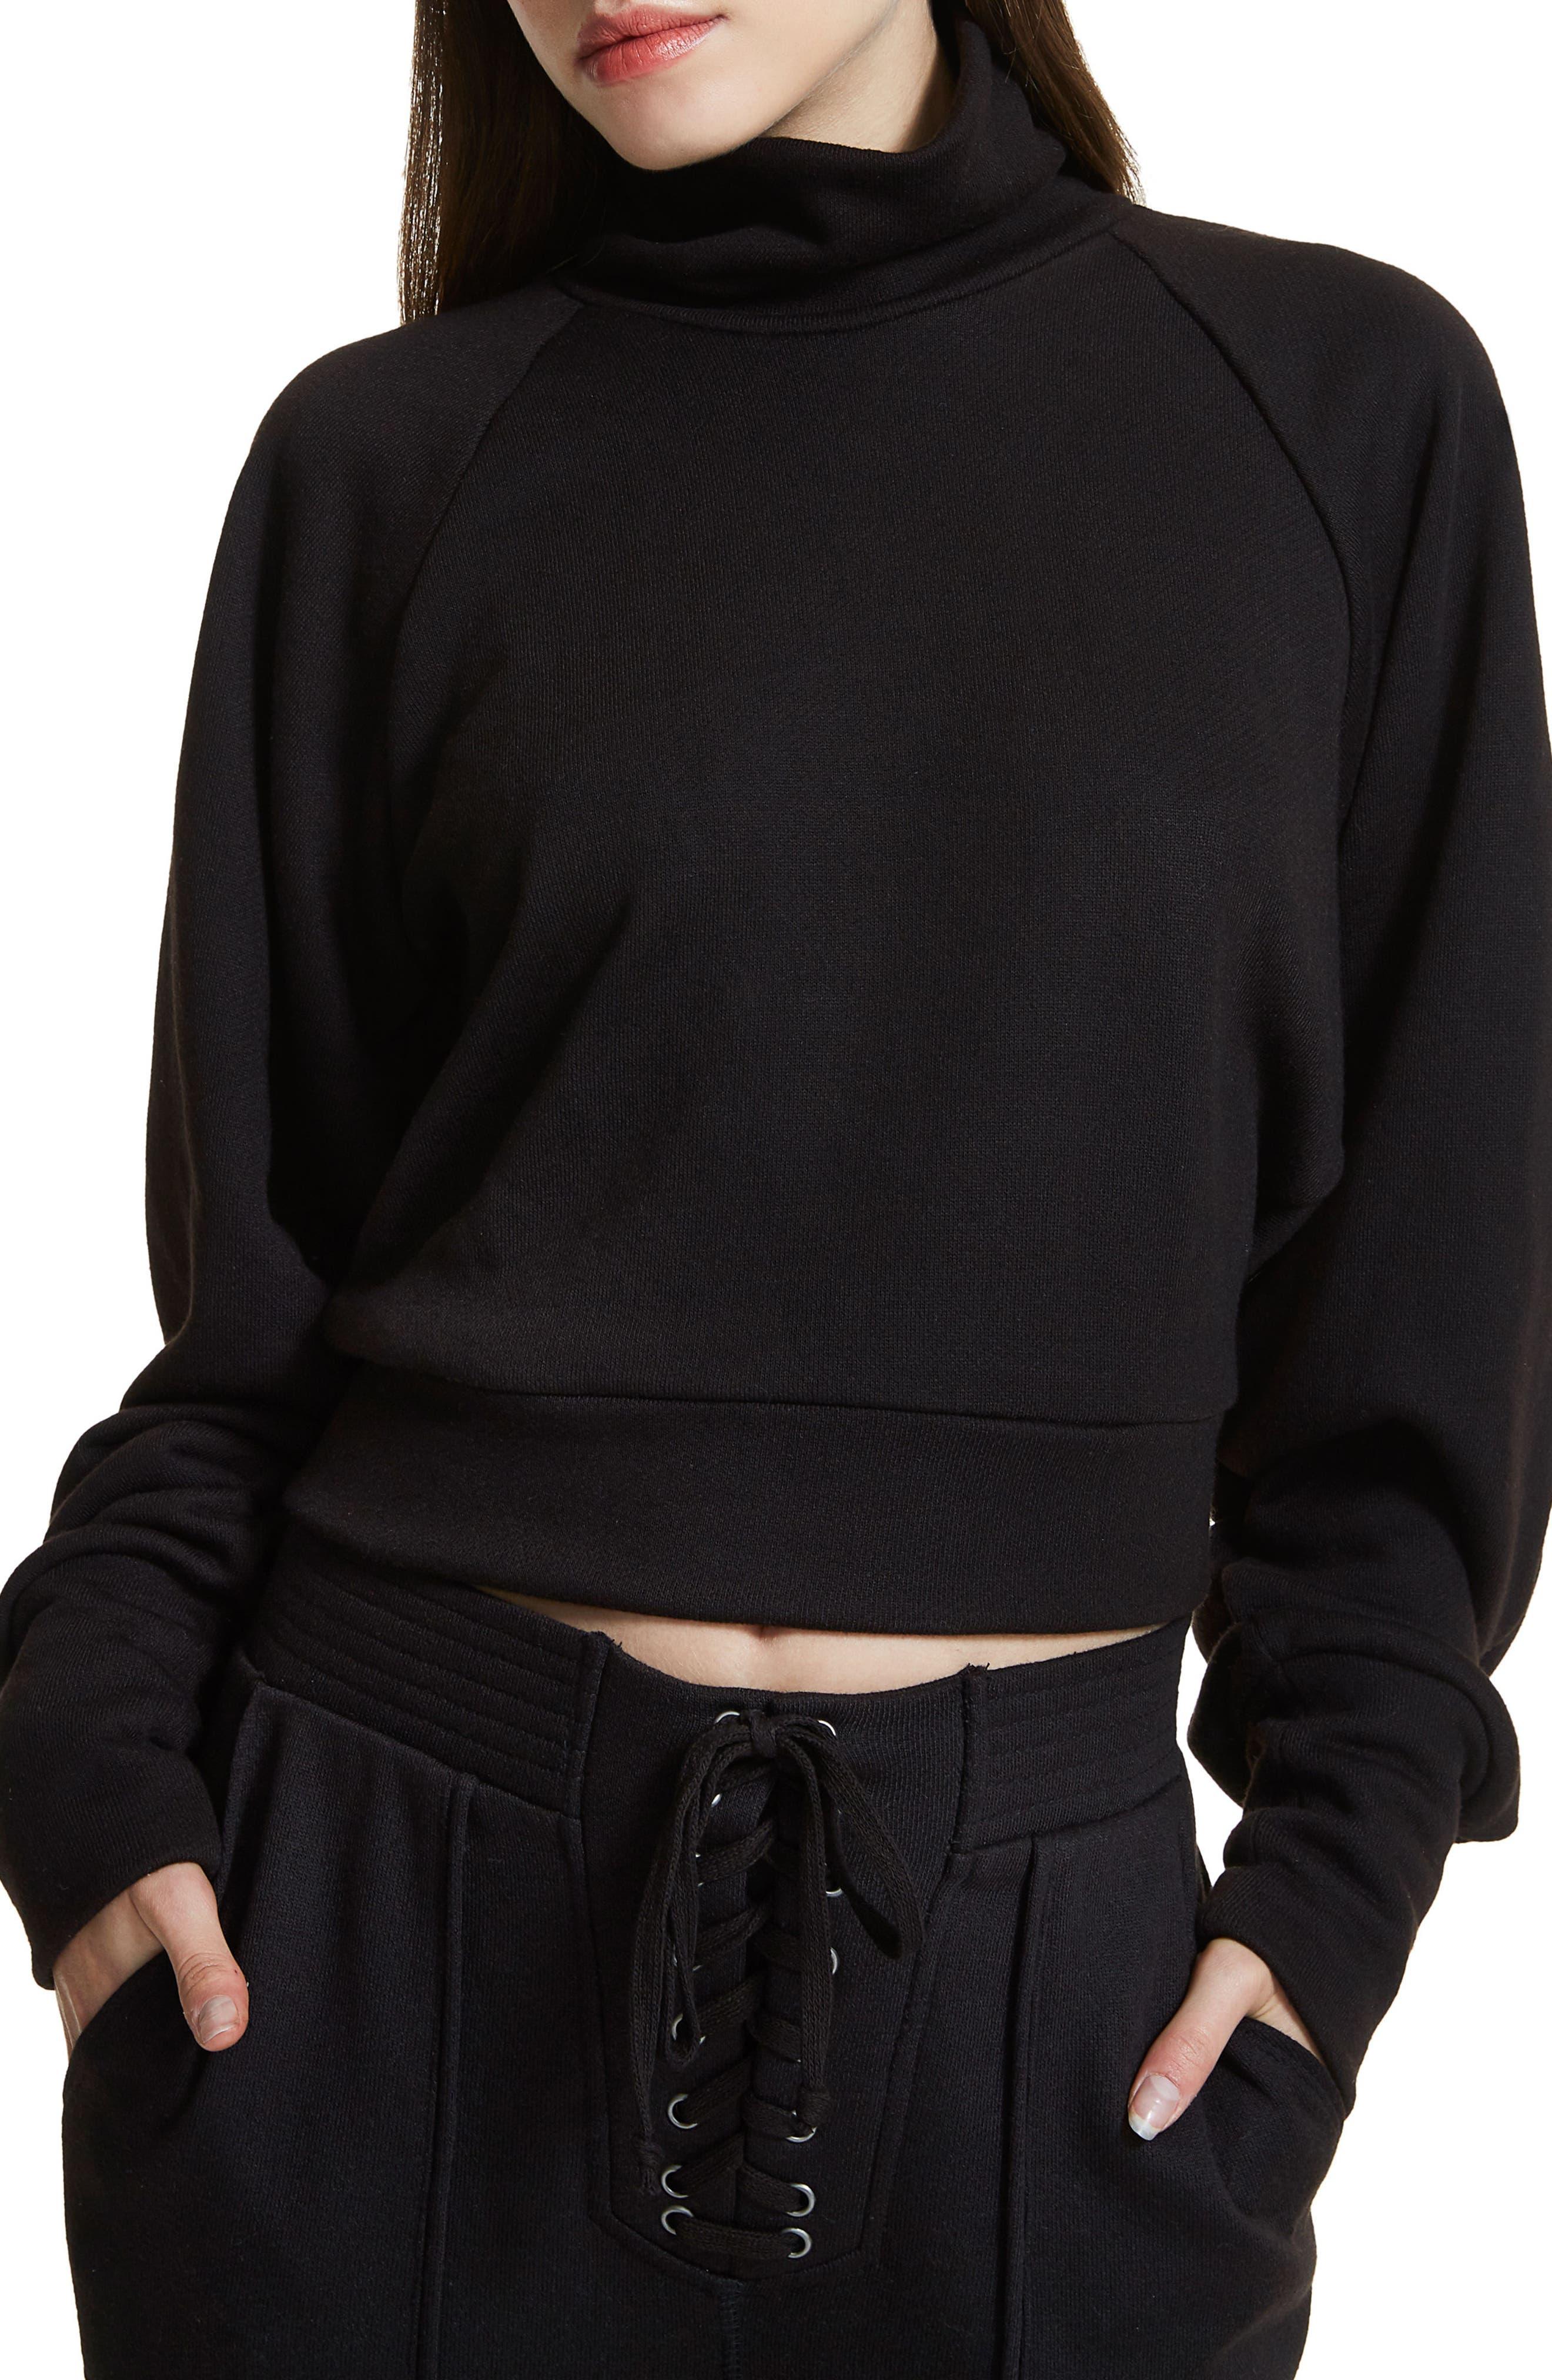 Jaxon Crop Turtleneck Sweatshirt,                             Main thumbnail 1, color,                             001